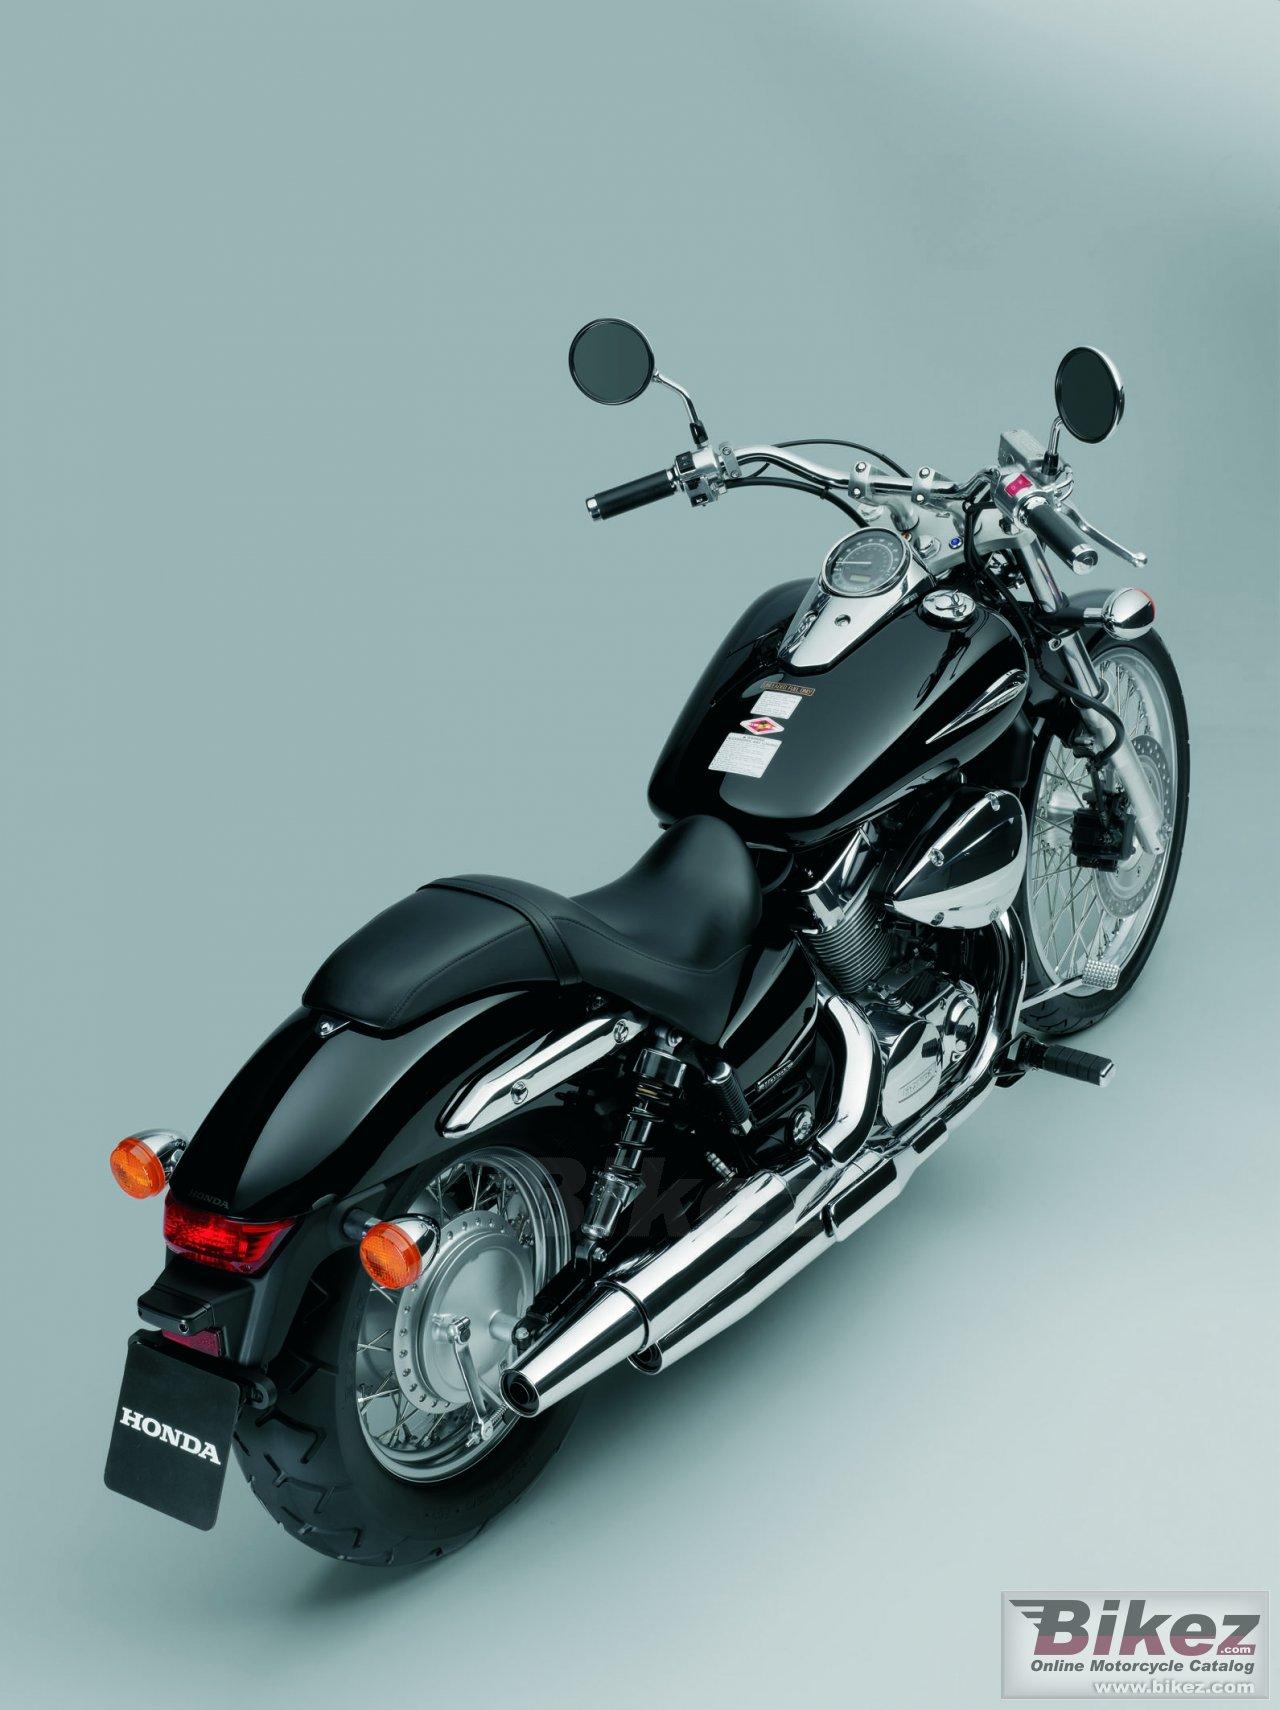 Honda Shadow Spirit 750 Dc Vt 750 Dc Picture